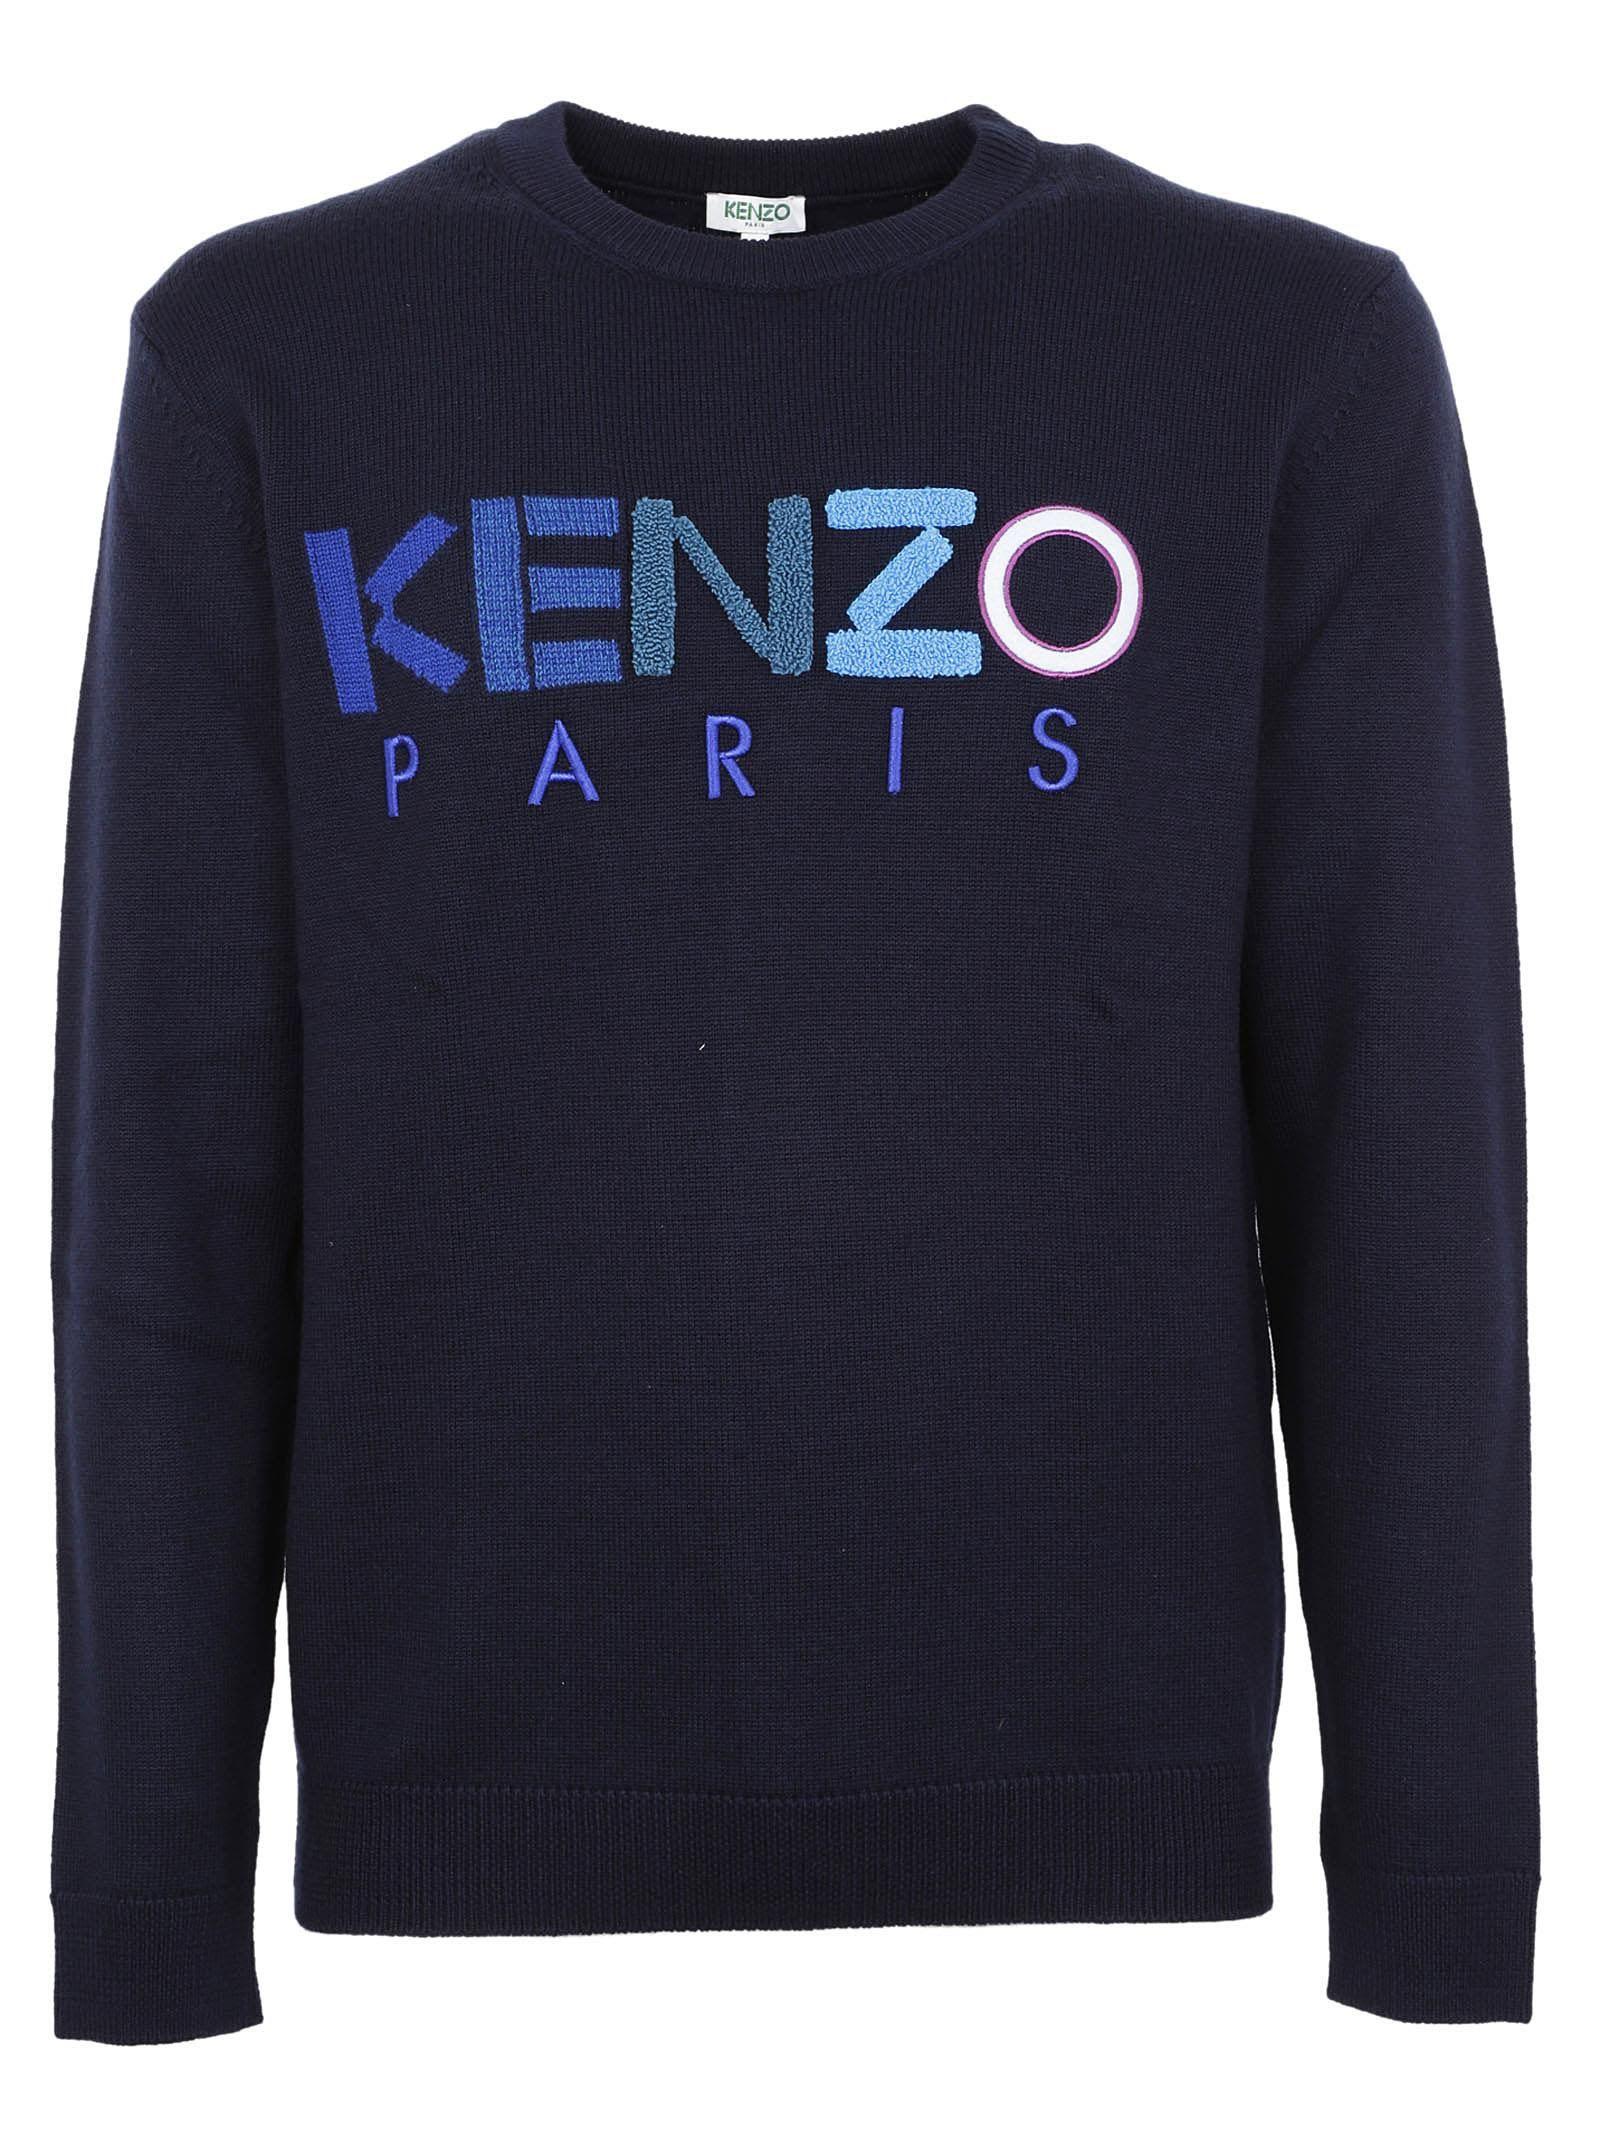 Kenzo Paris Homme Sweatshirt Black Medium Kenzo Shirt Jumper Pullover wCr3GsUE